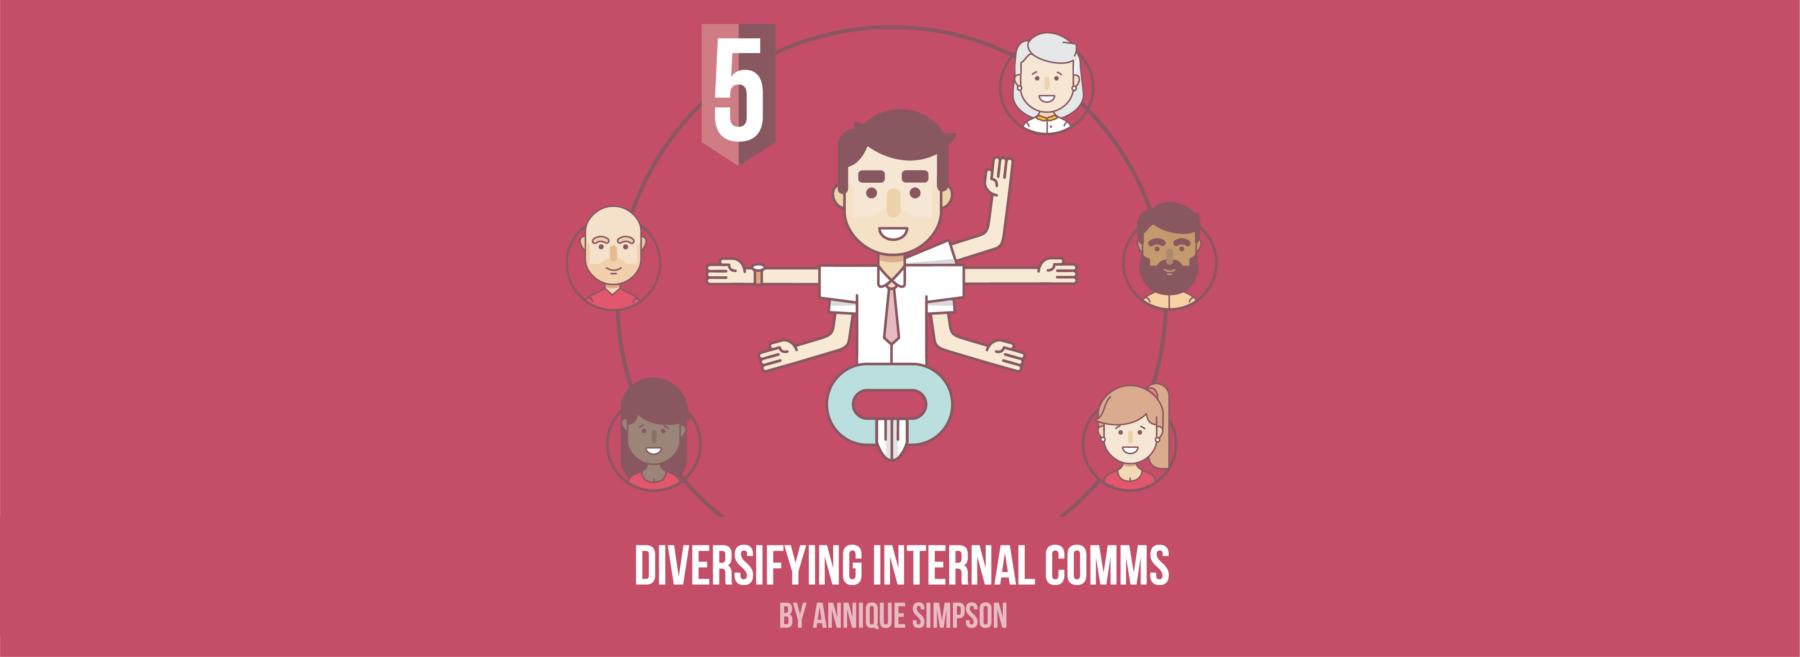 Diversifying Internal Comms